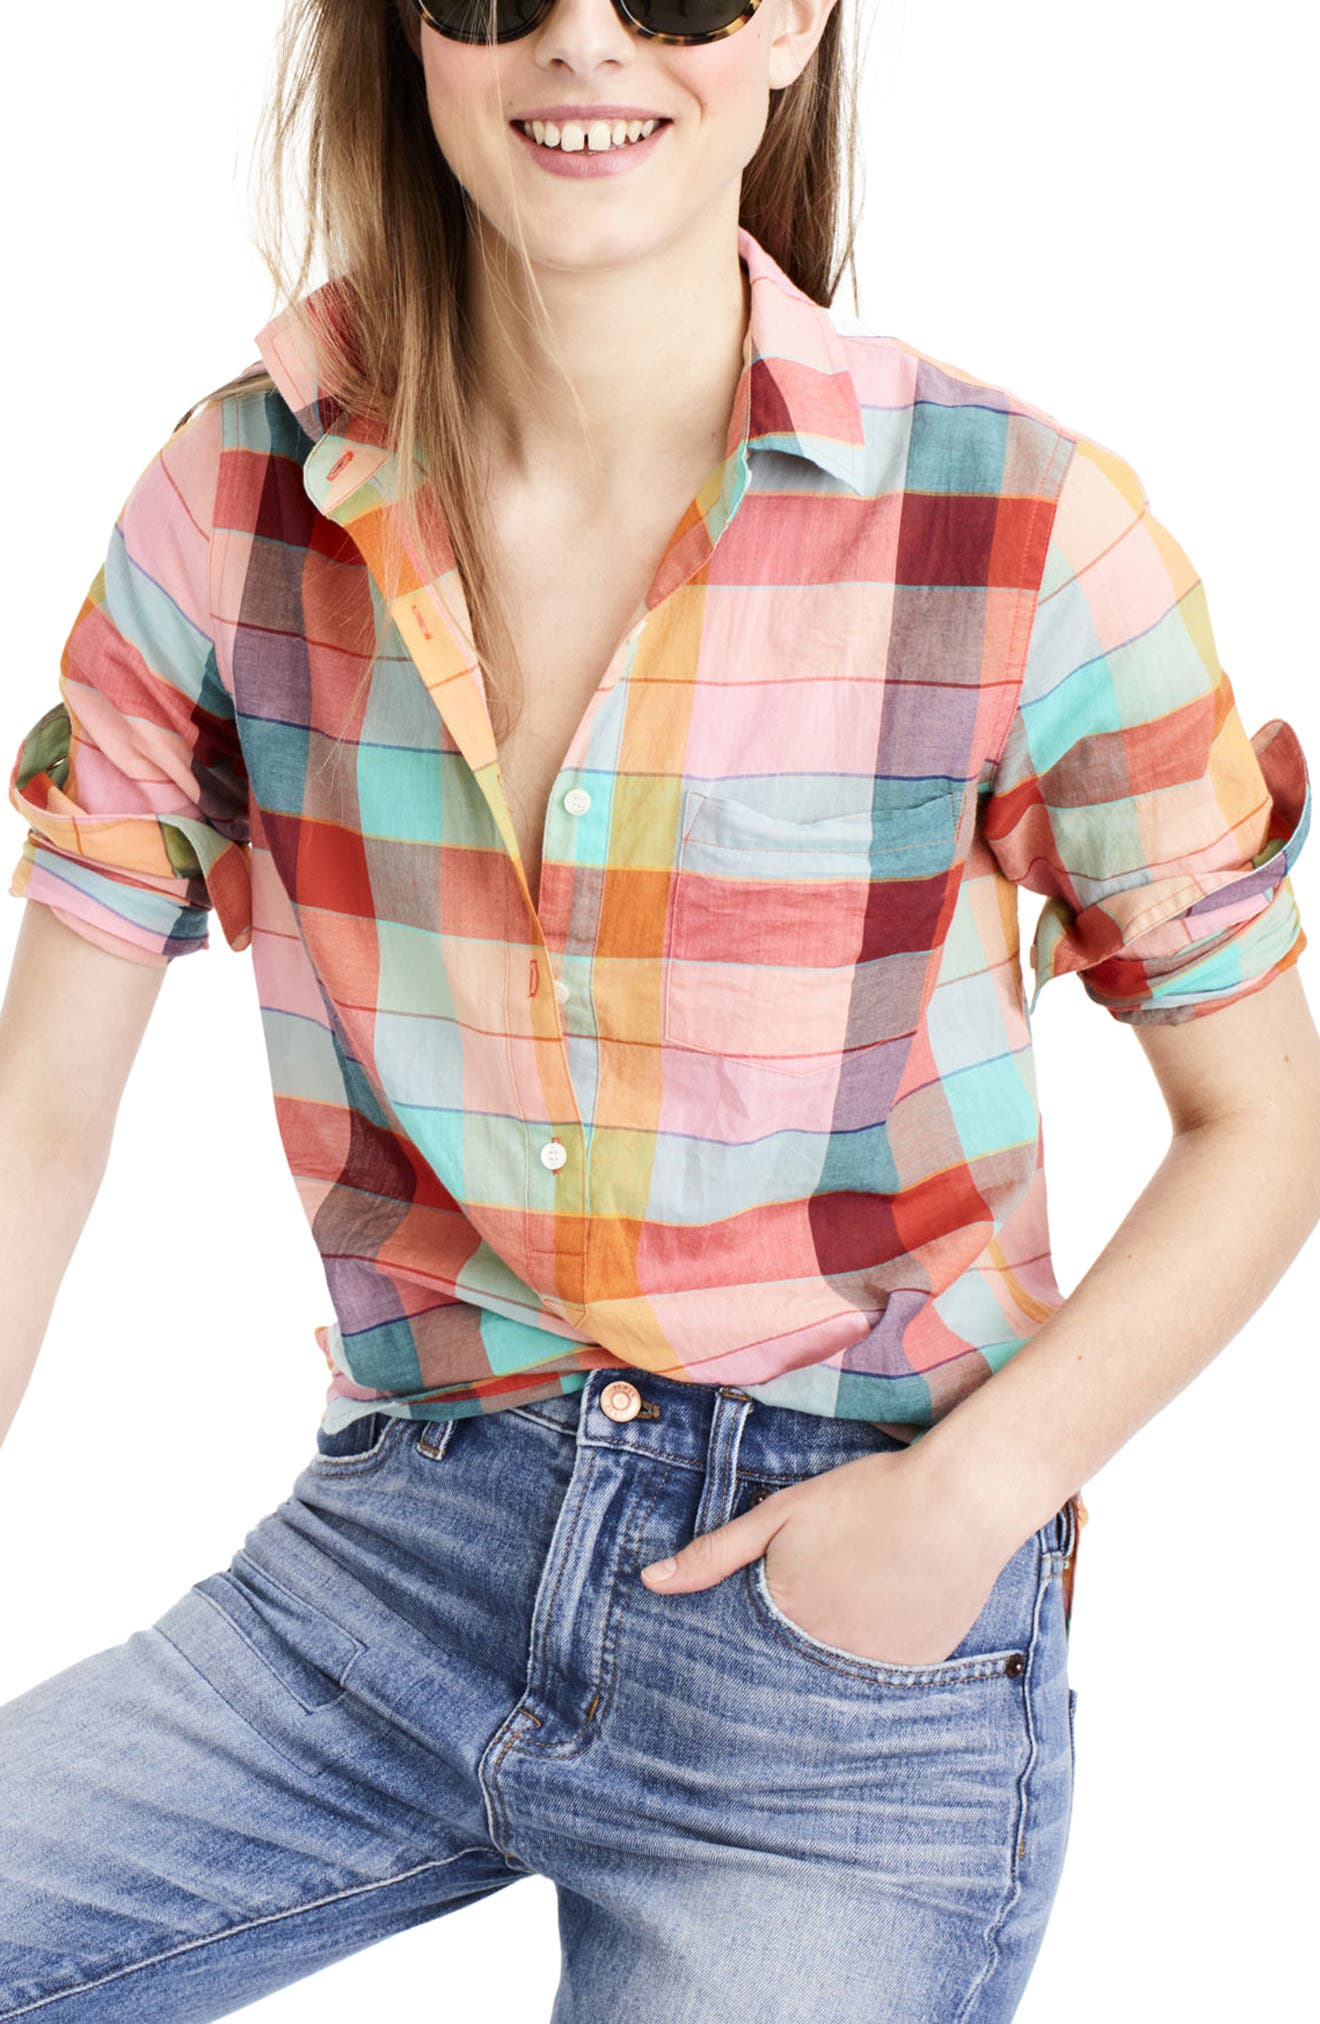 Main Image - J.Crew Rainbow Vintage Plaid Lightweight Popover Shirt (Regular & Petite)